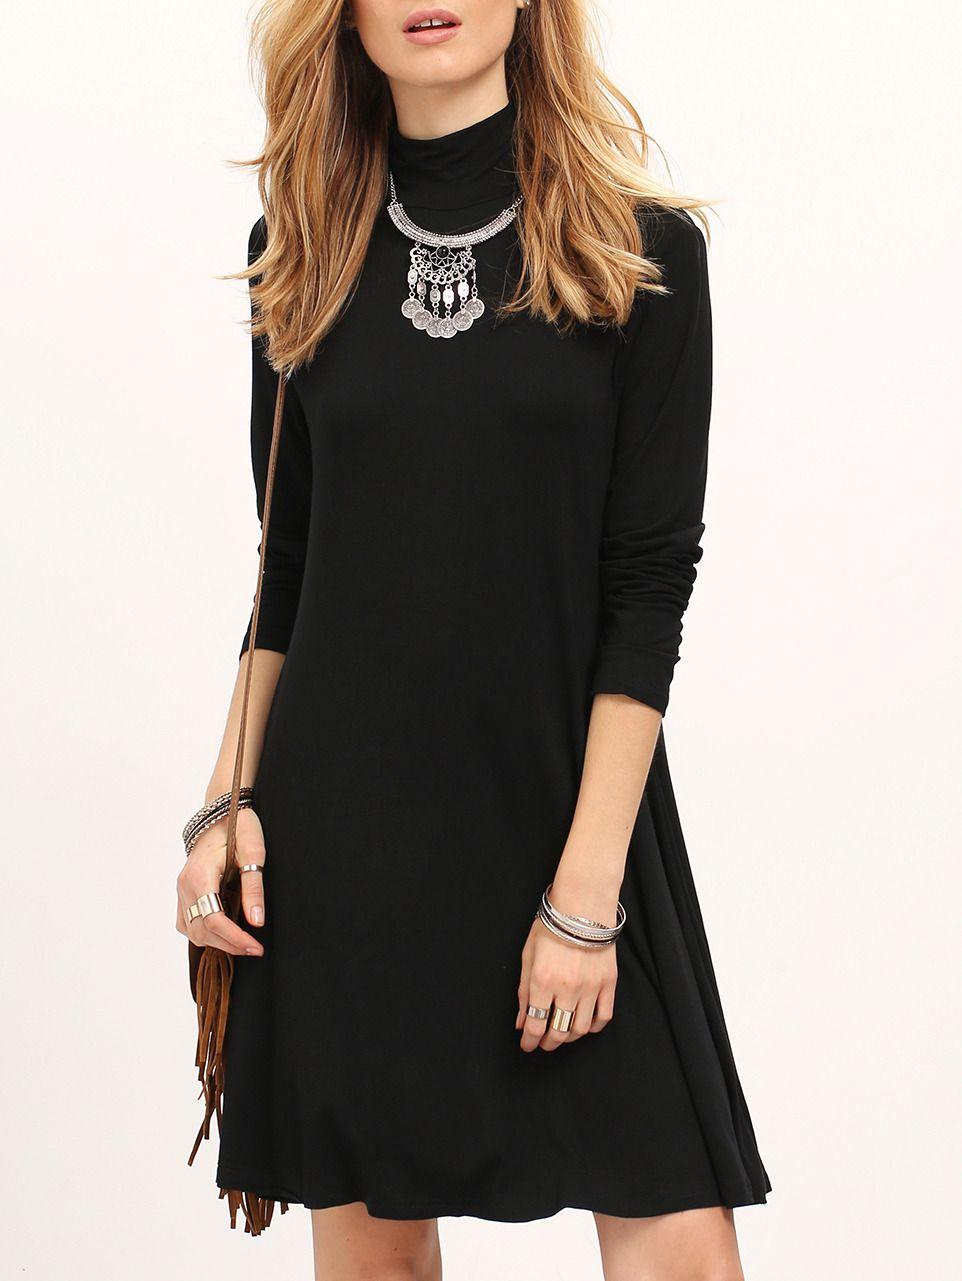 Black Long Sleeve Turtleneck Flare Dress Shein Sheinside Long Sleeve Turtleneck Dress Clothes Short Flare Dress [ 1281 x 962 Pixel ]